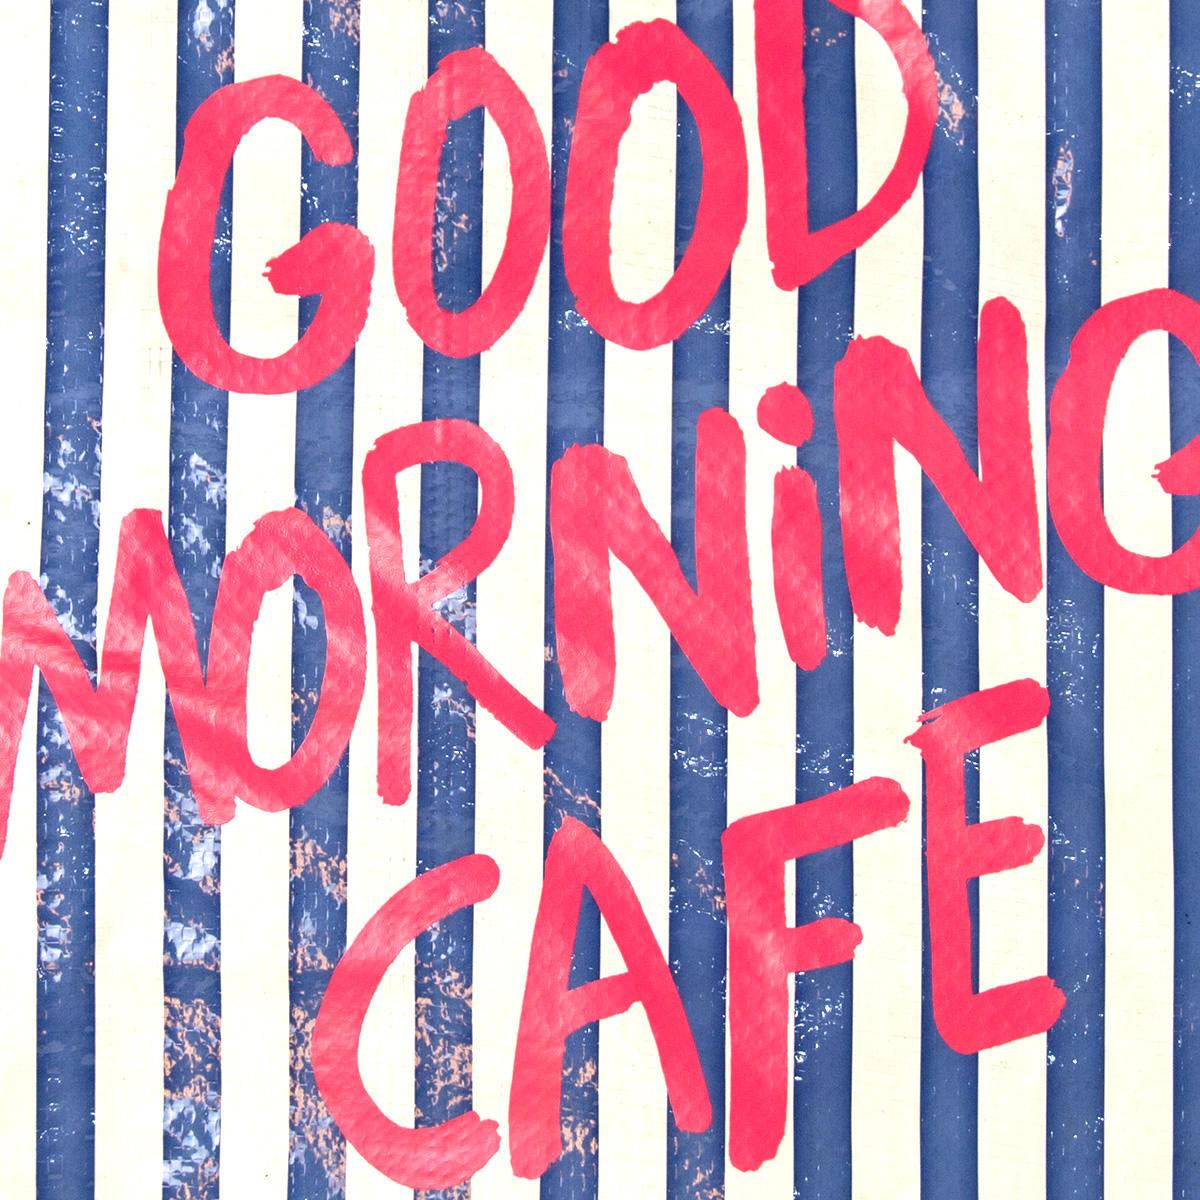 GOOD MORNING CAFE/ノベルティーデザイン(エコバッグ)